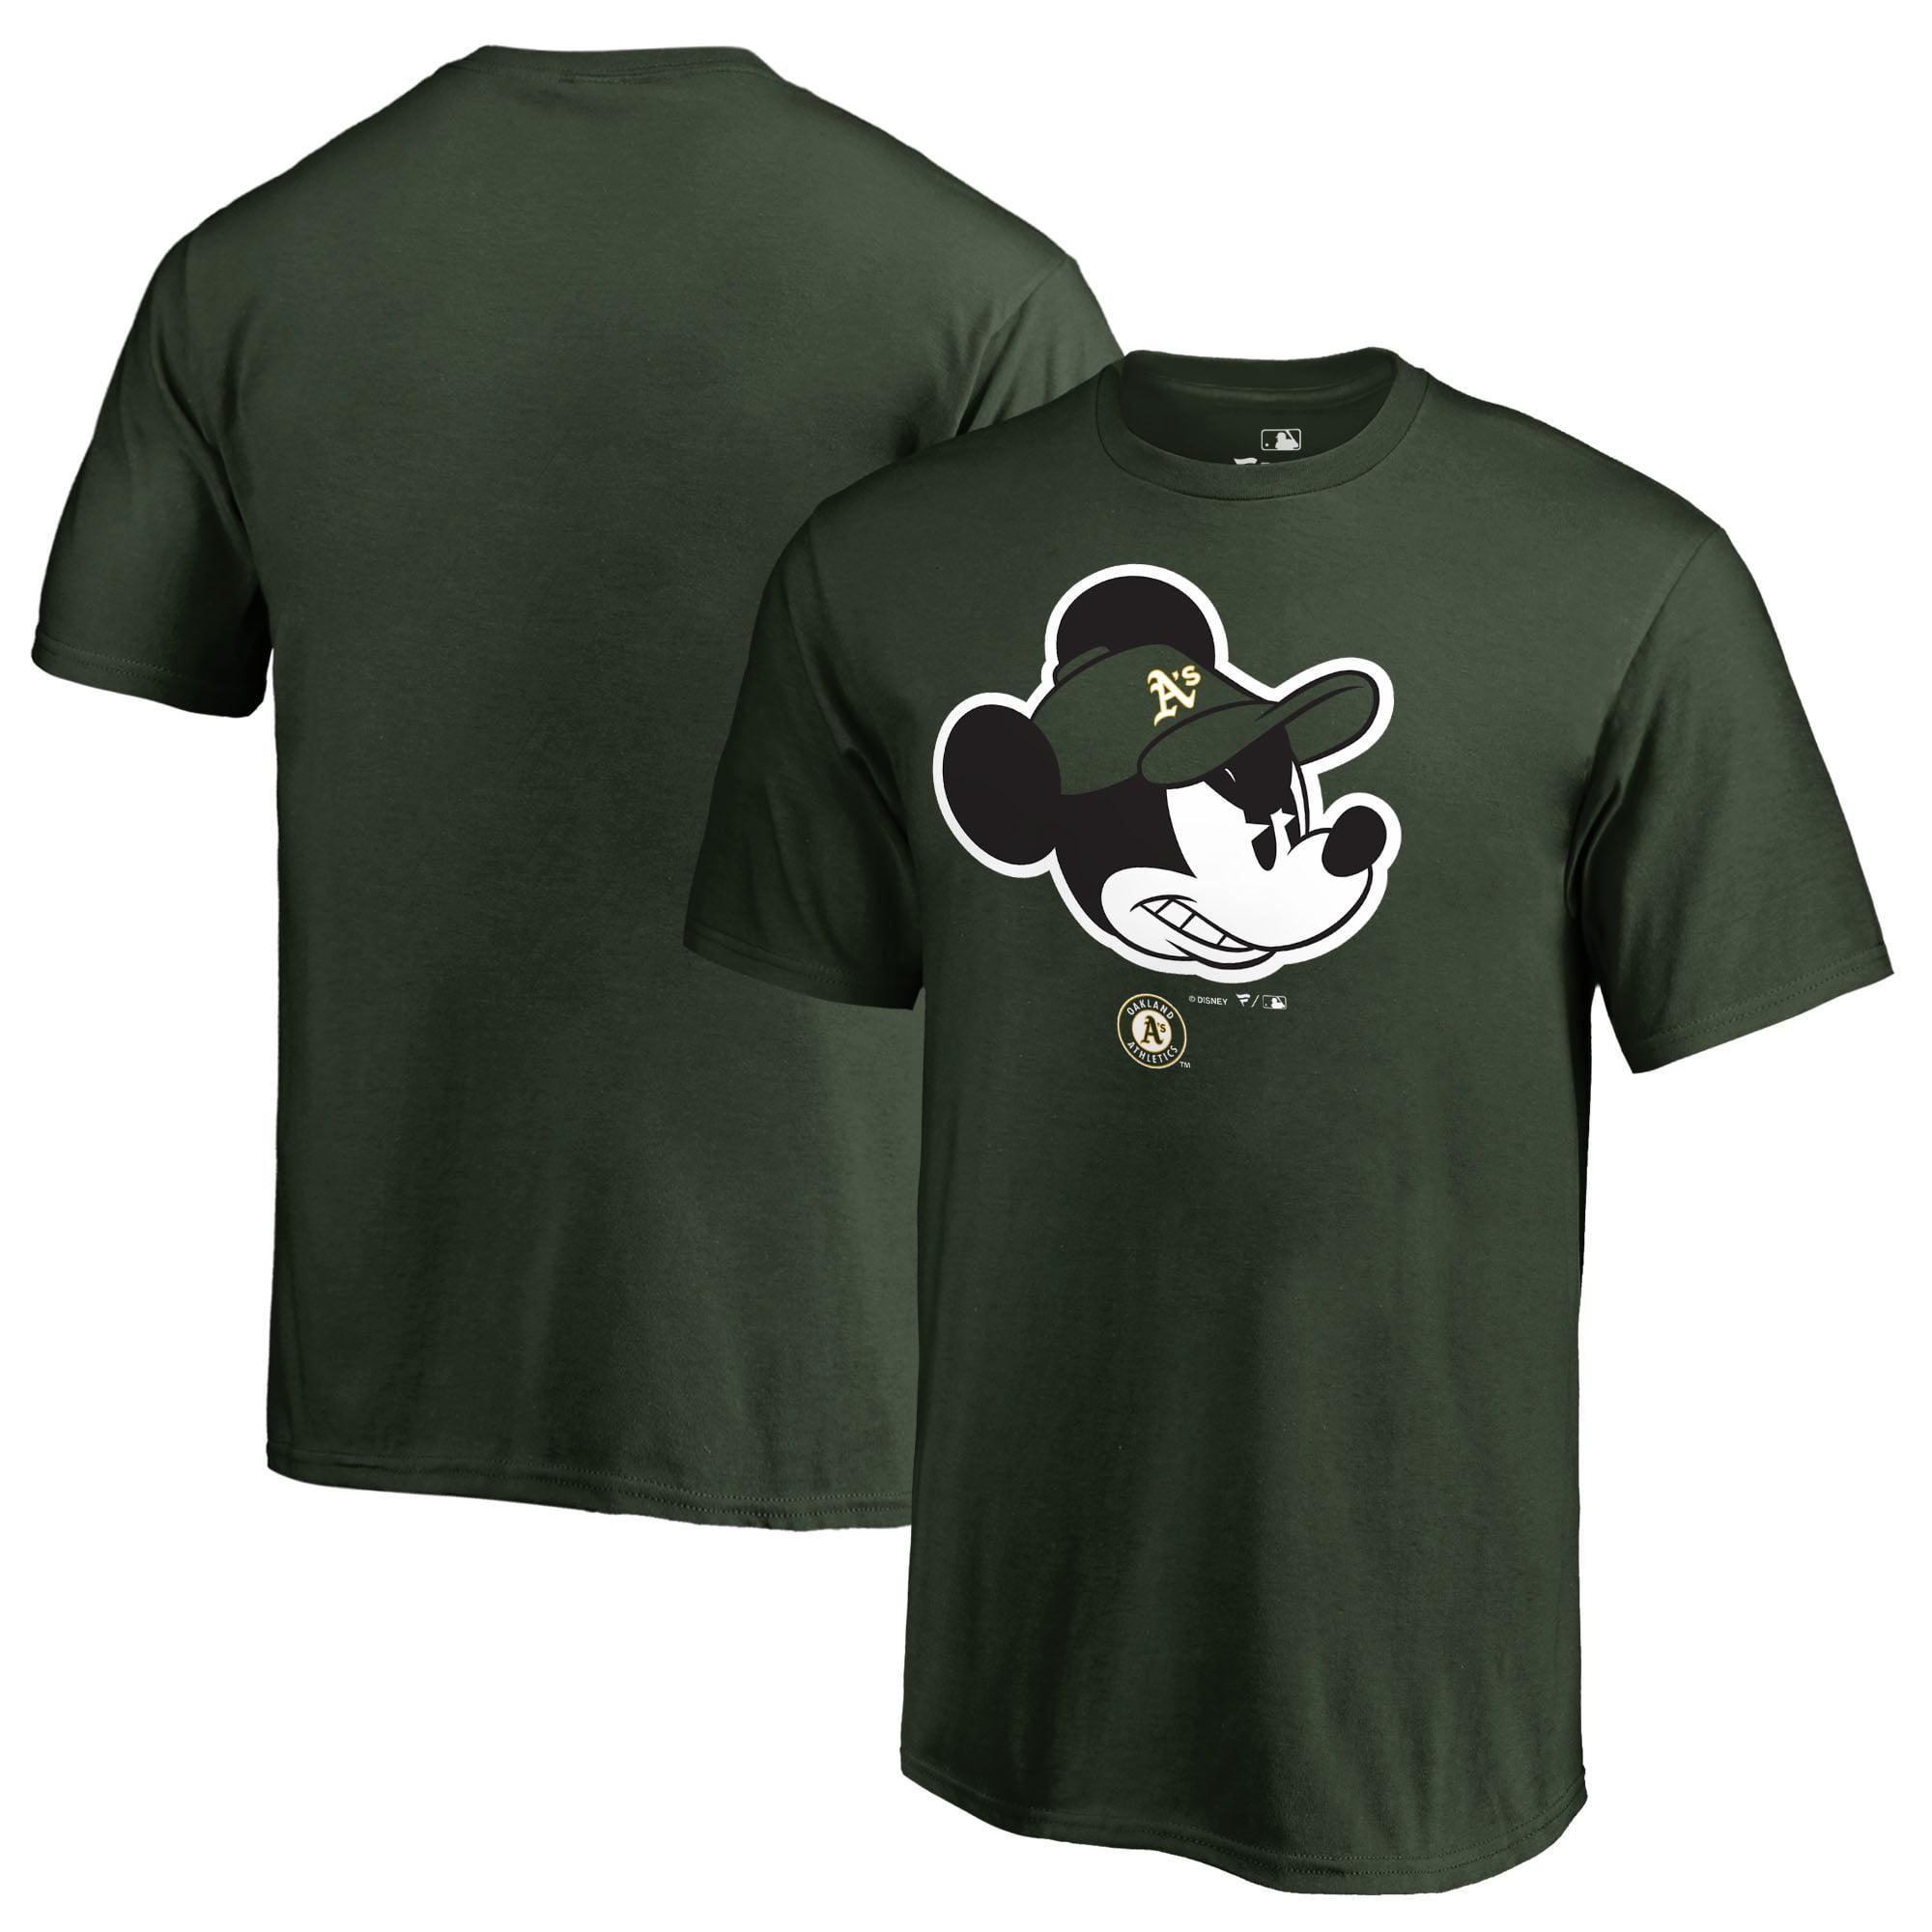 Oakland Athletics Fanatics Branded Youth Disney Game Face T-Shirt - Green